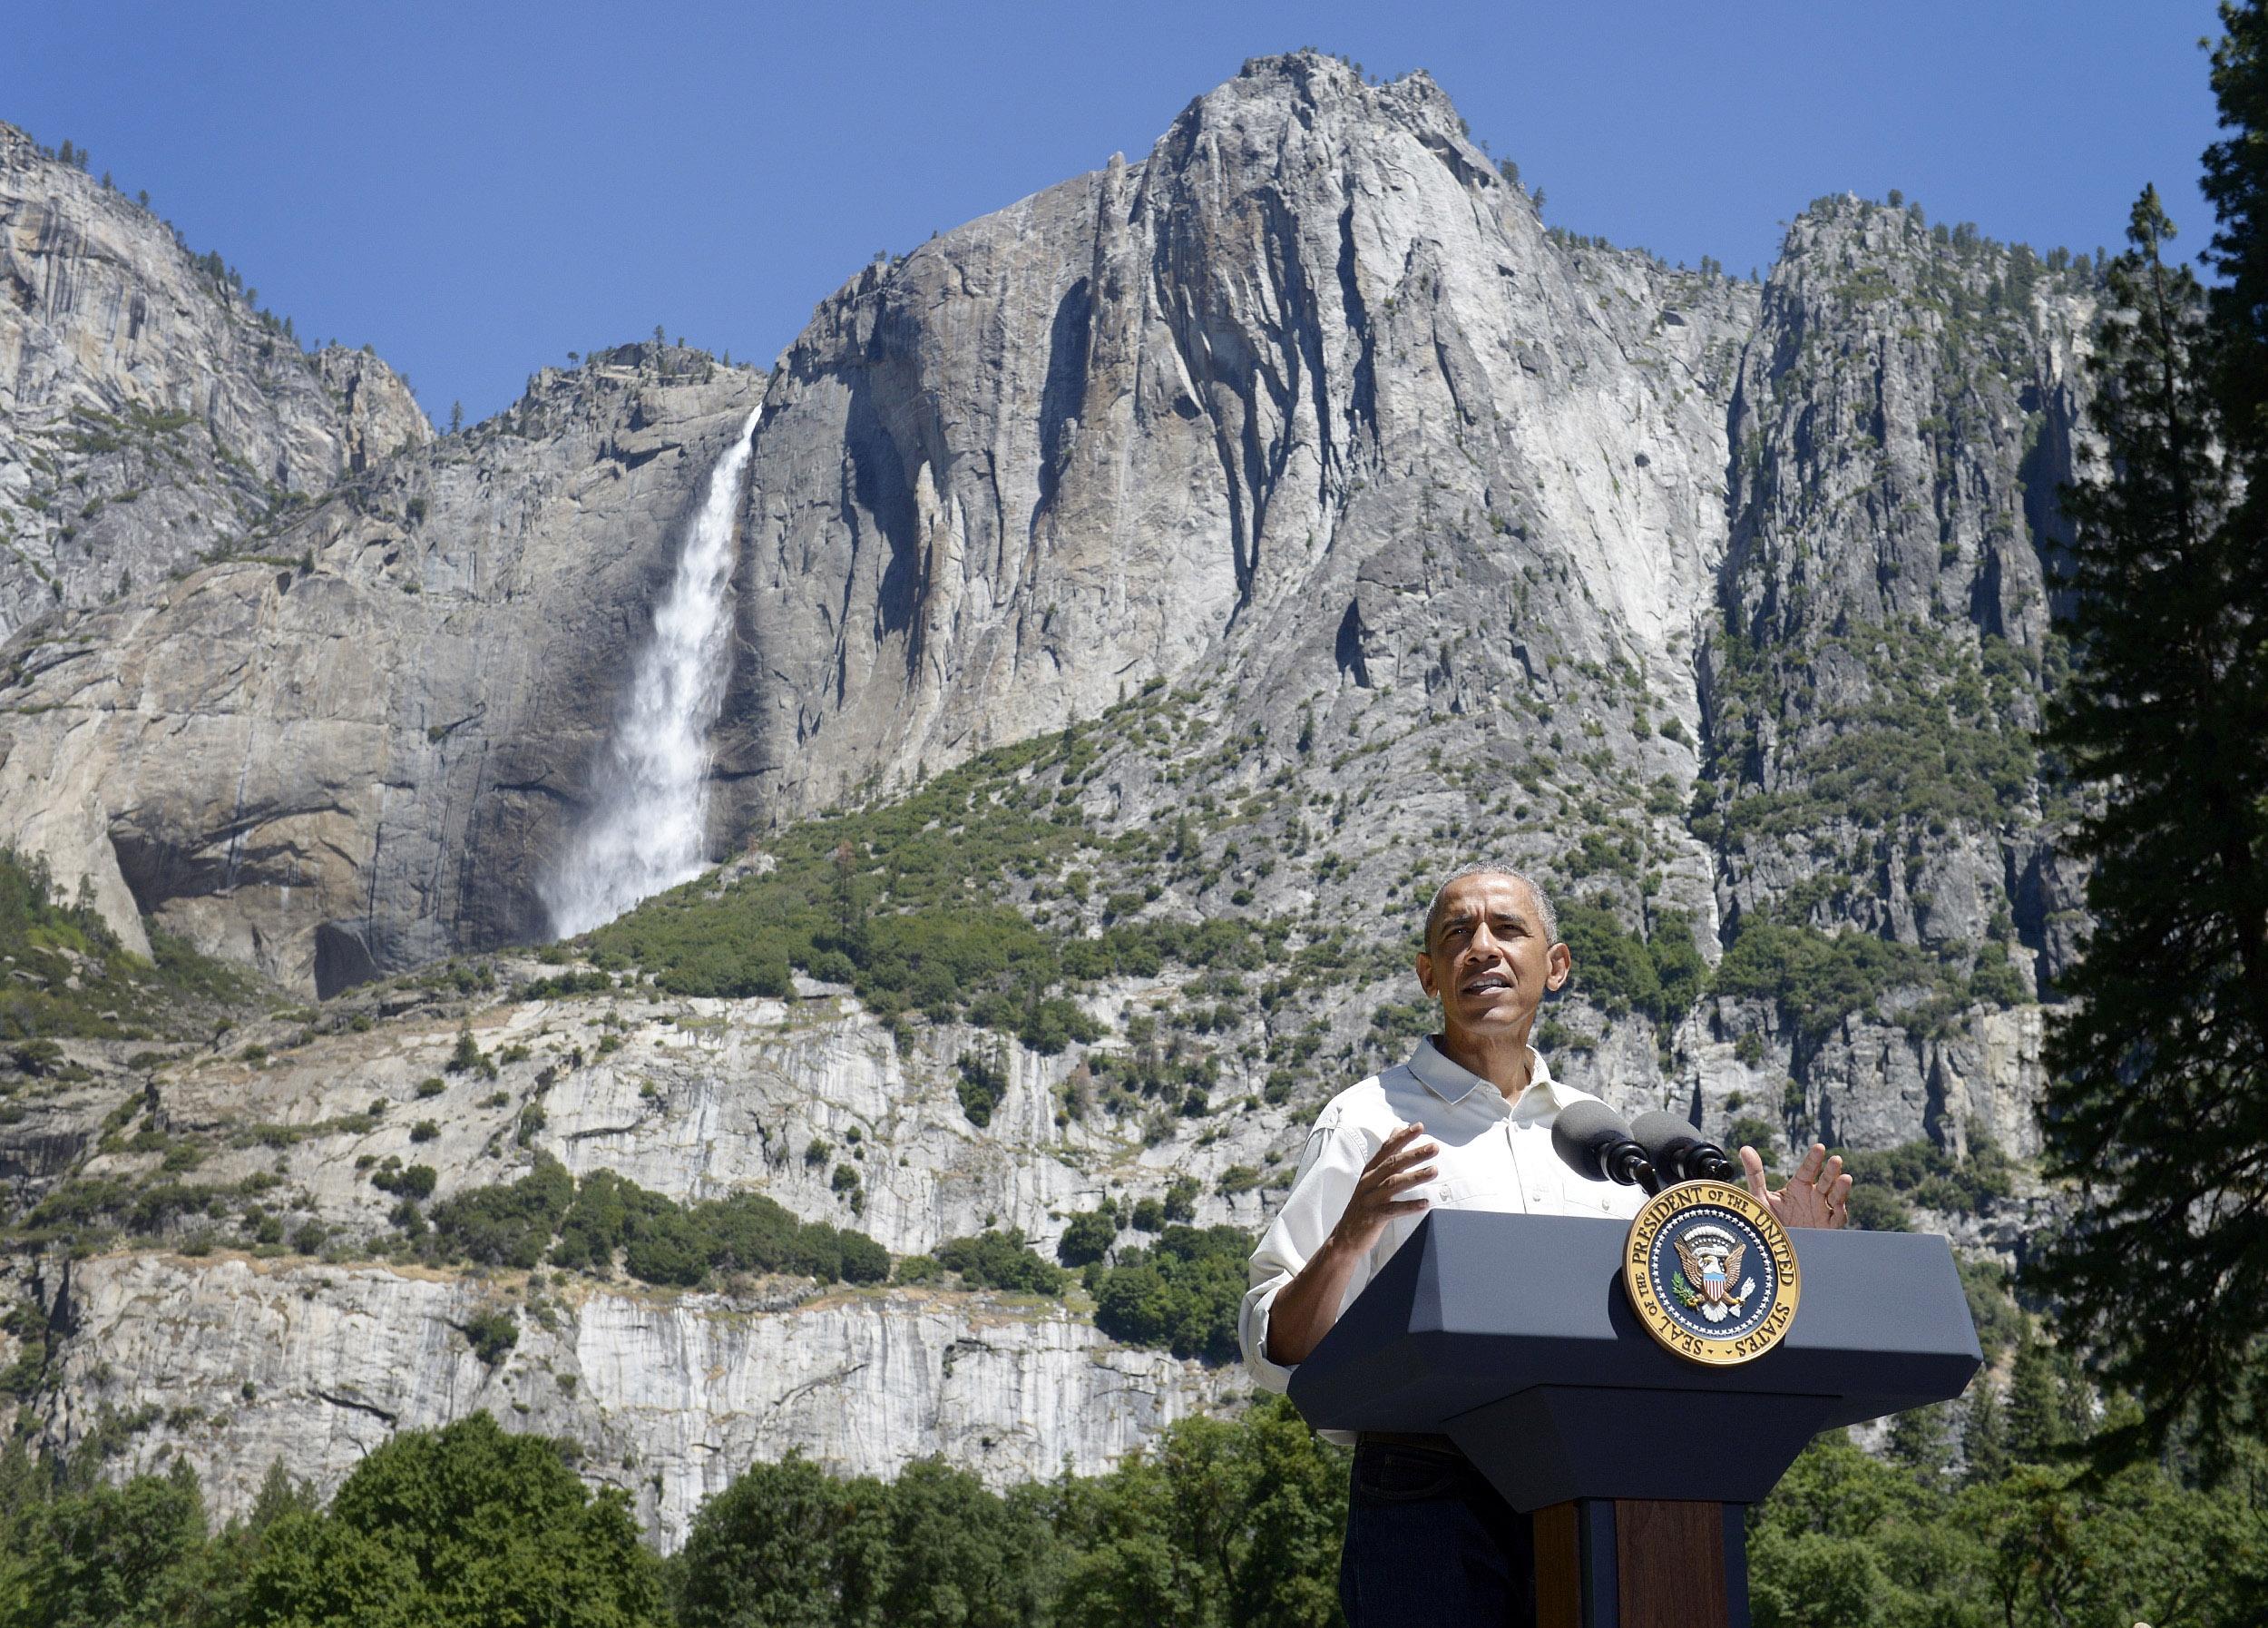 Ocululs Debuts 360 Video of President Obama at Yosemite National ...